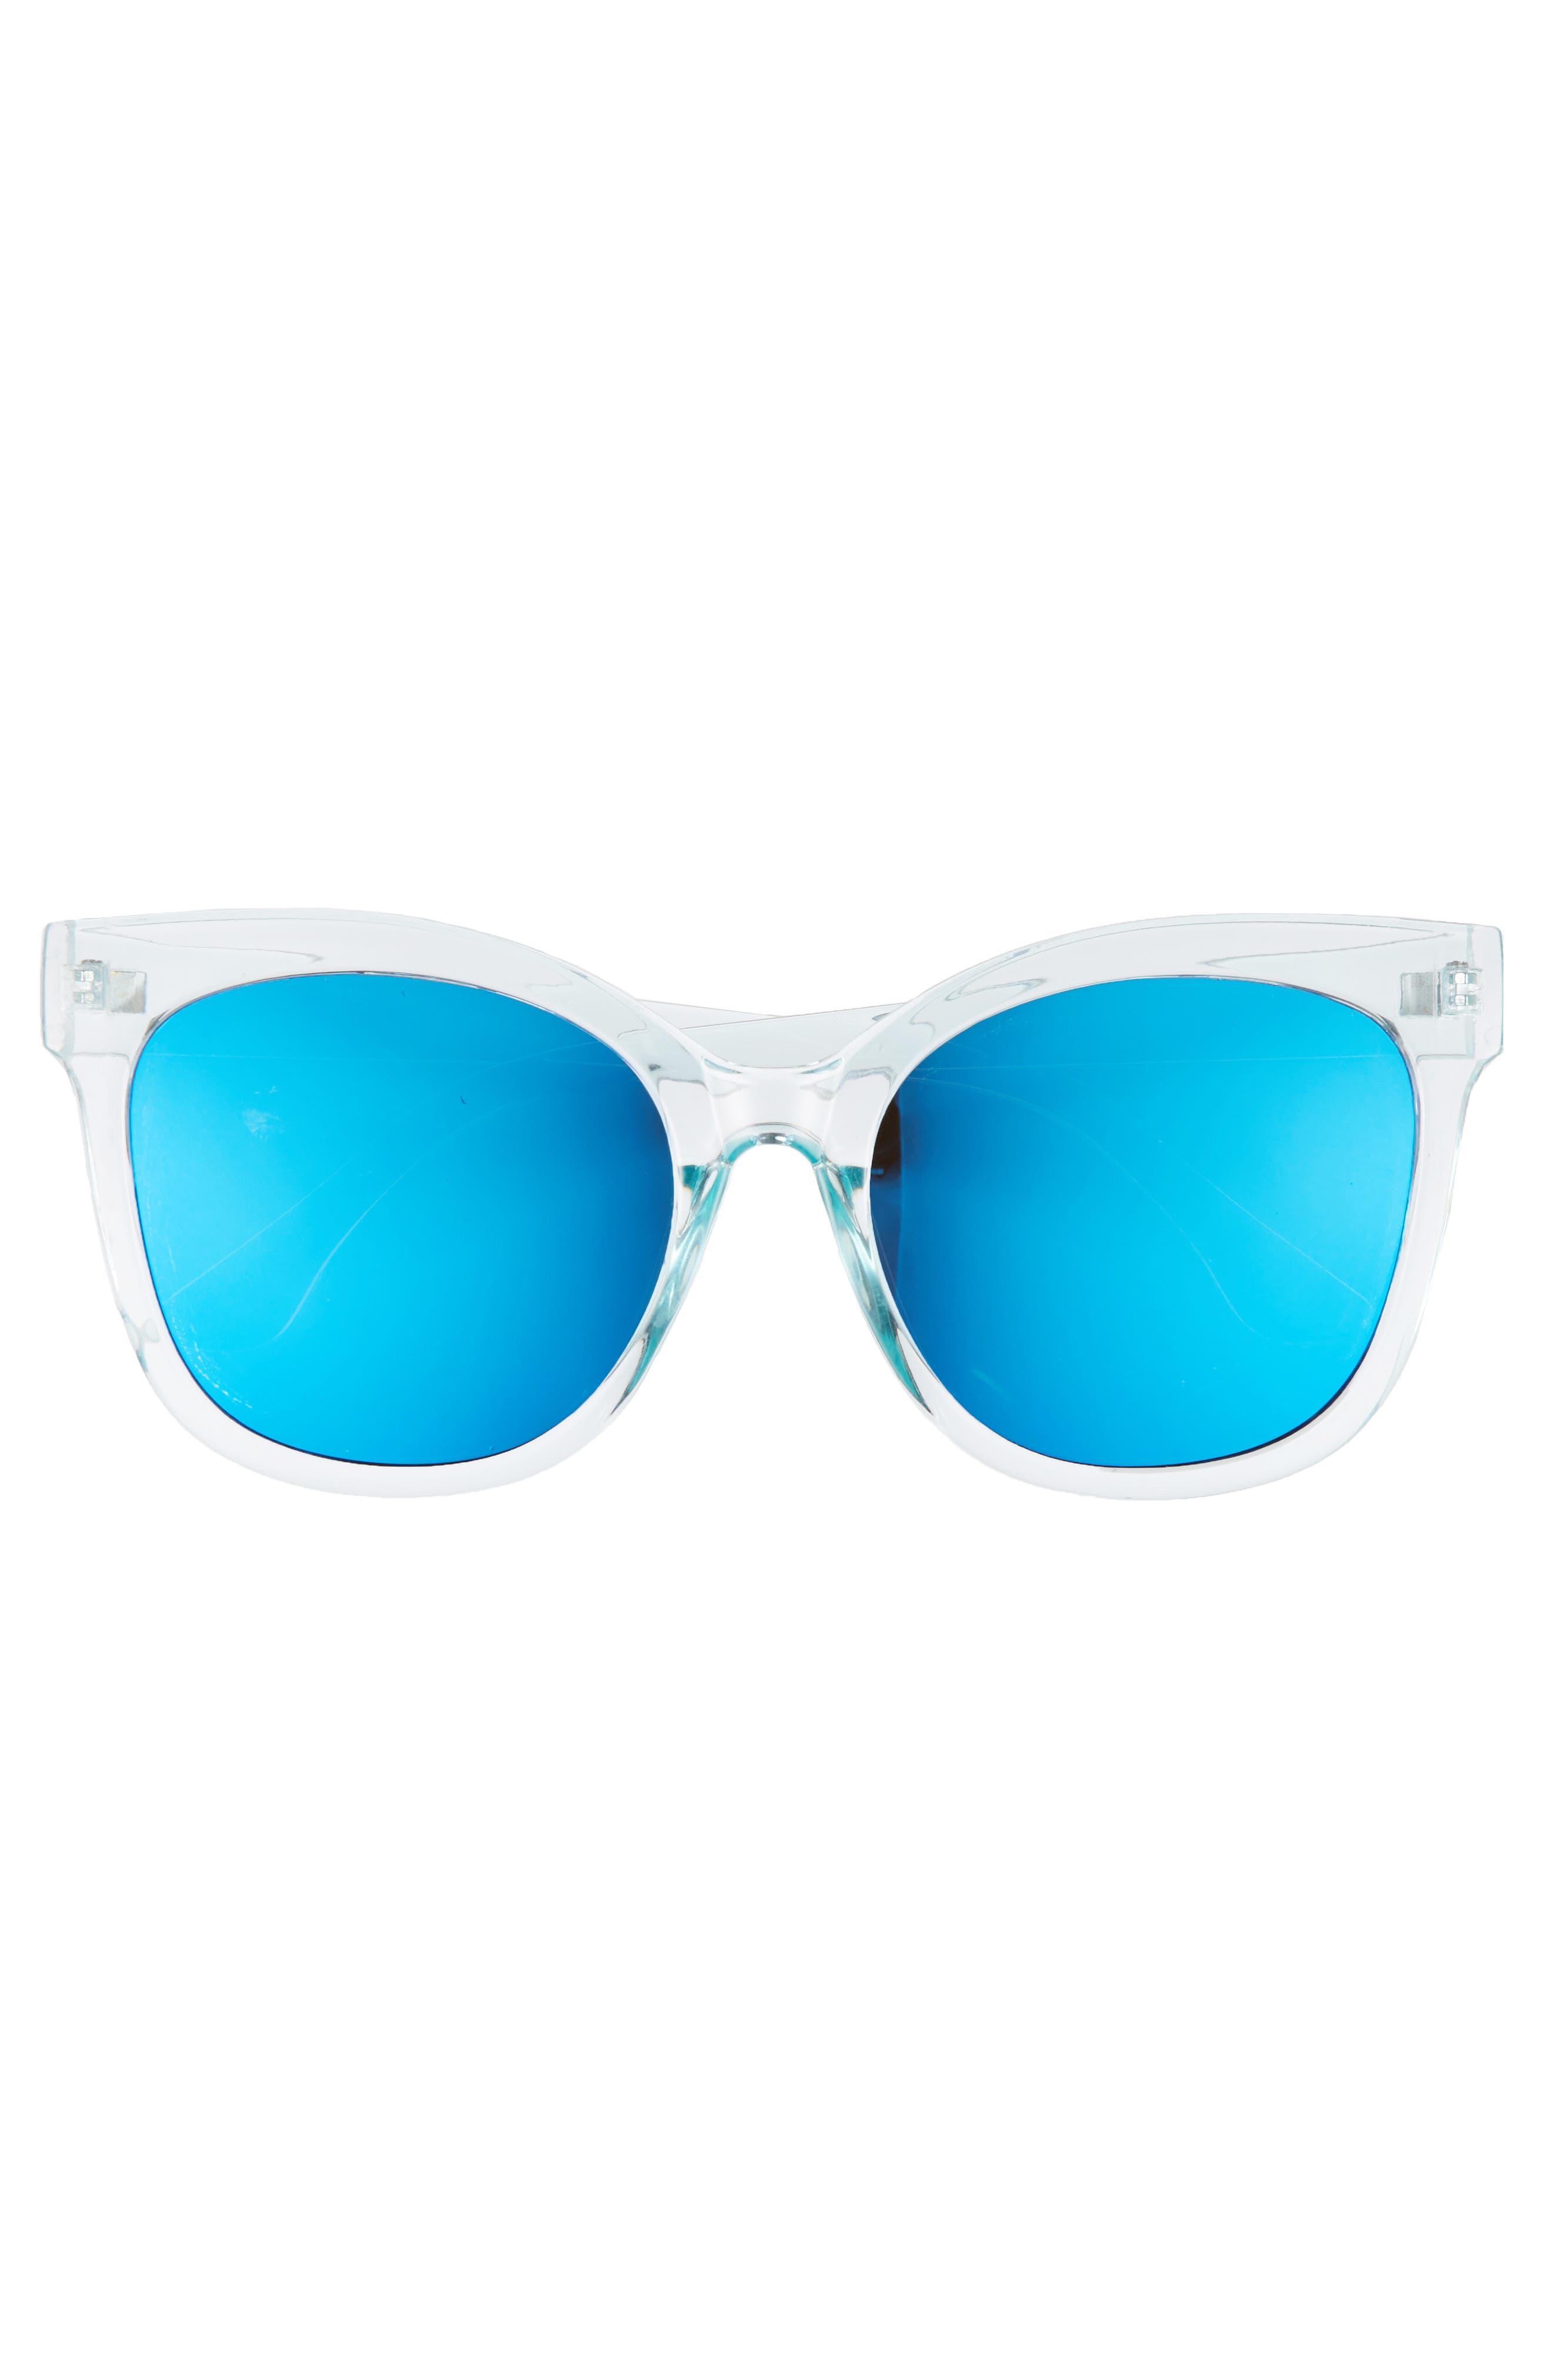 57mm Cat Eye Sunglasses,                             Alternate thumbnail 3, color,                             300